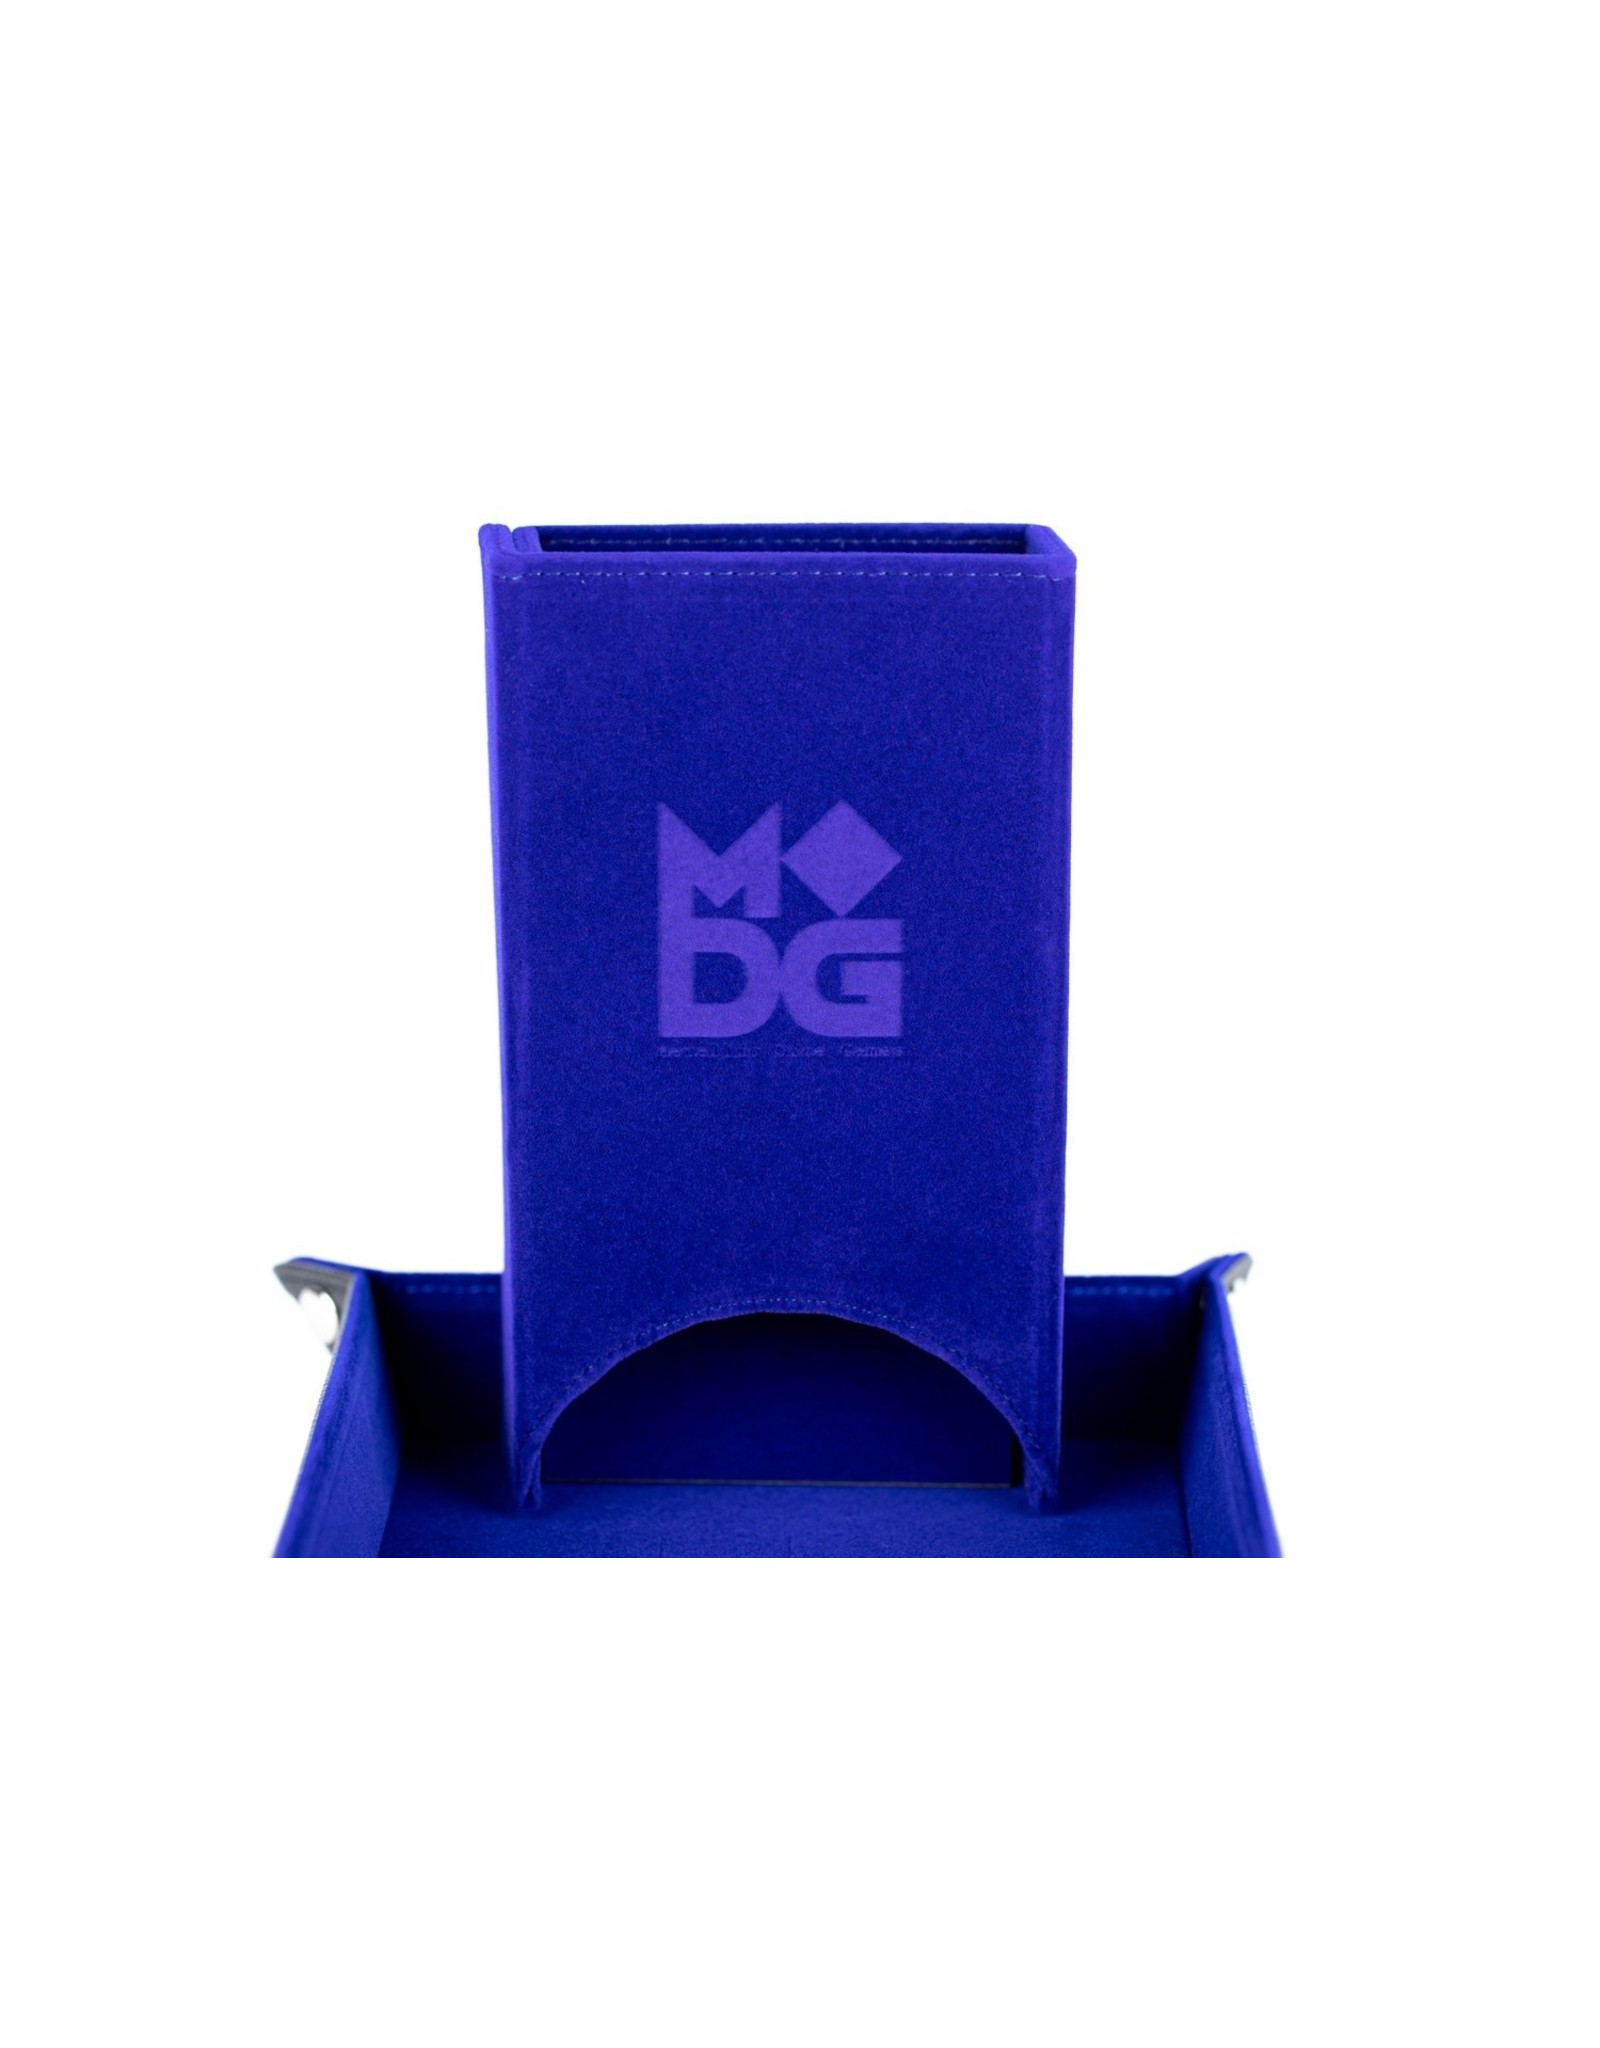 Metallic Dice Games Velvet Fold Up Dice Tower: Blue